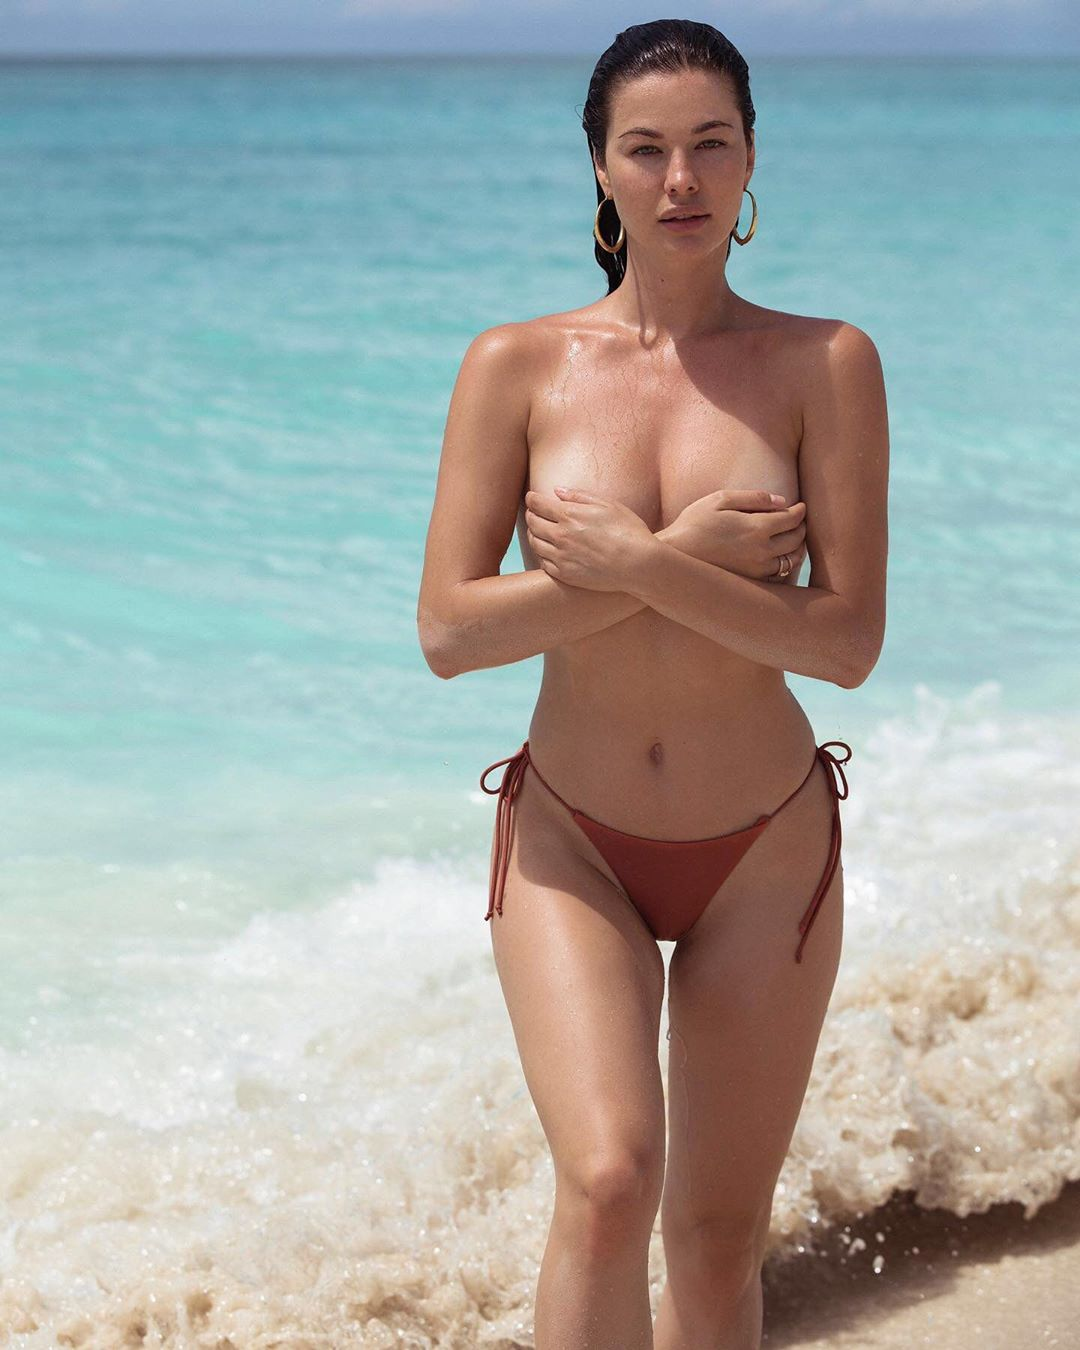 Jennie holland